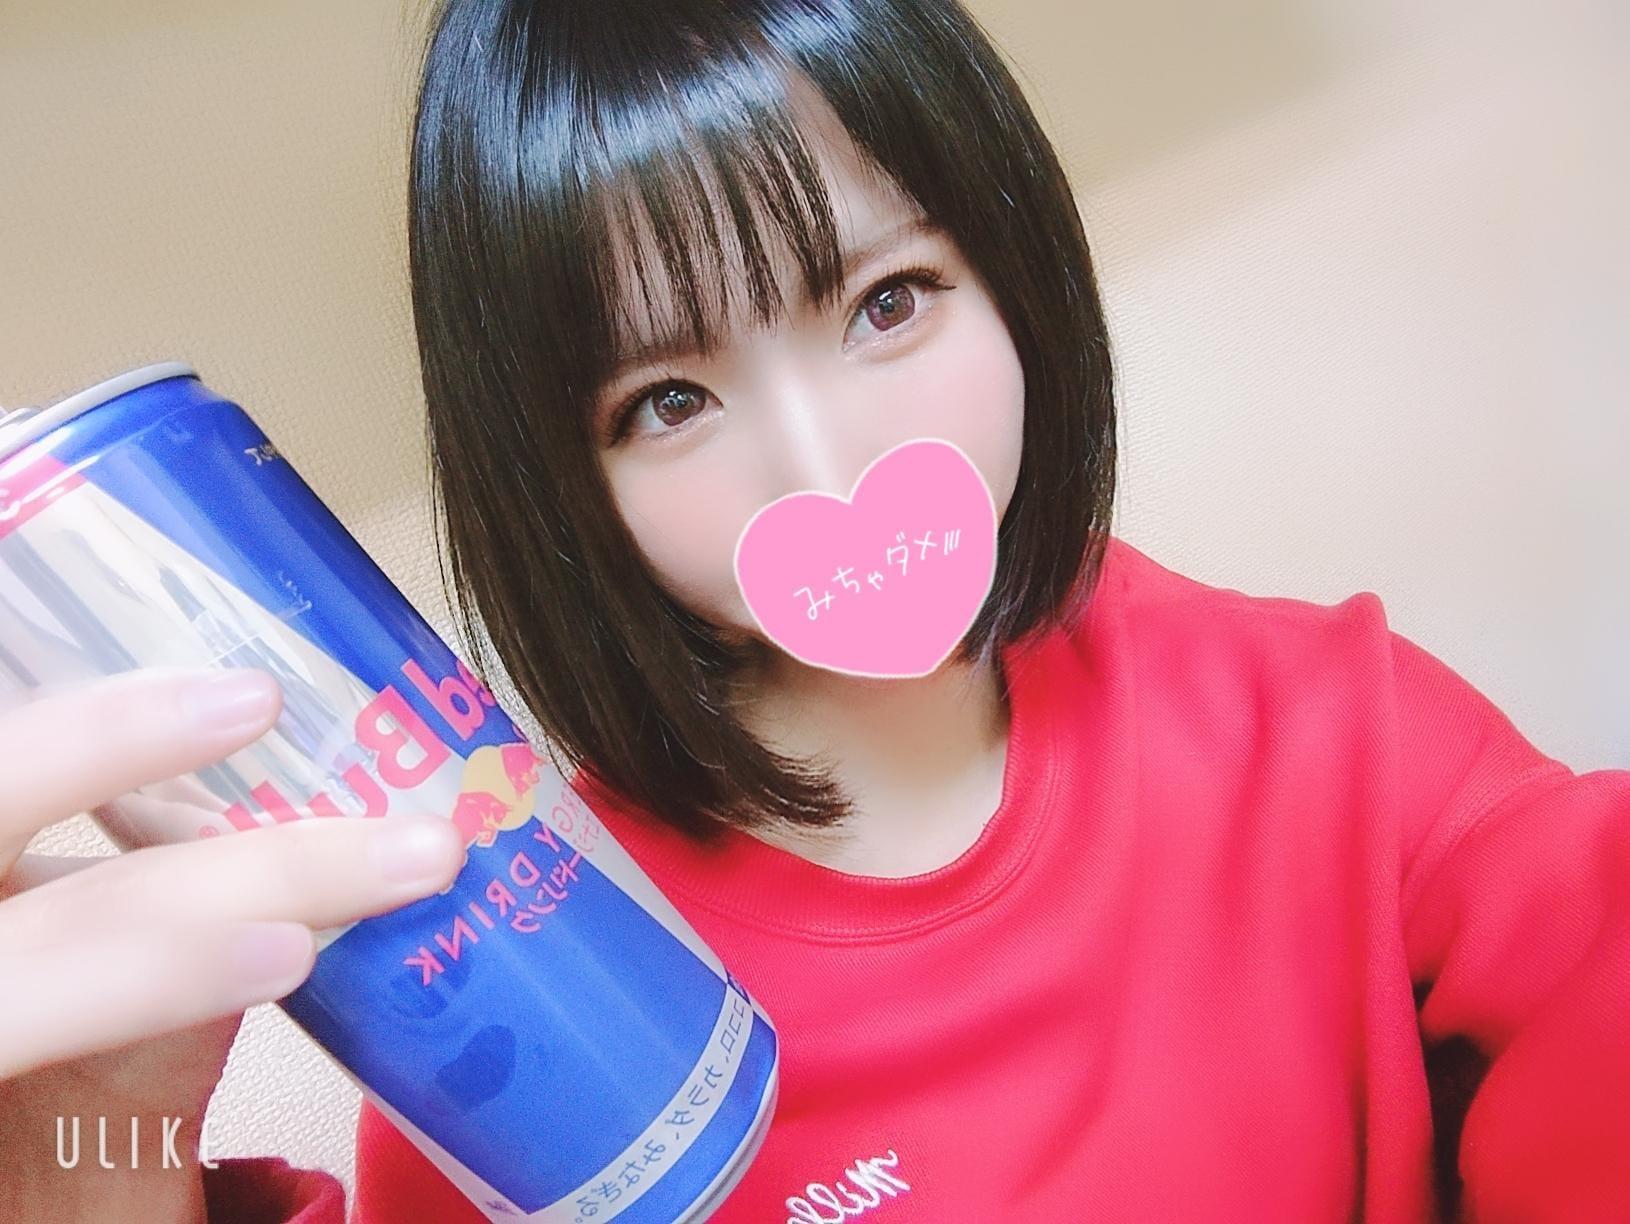 「thx♡」02/17(02/17) 21:58 | アリスの写メ・風俗動画